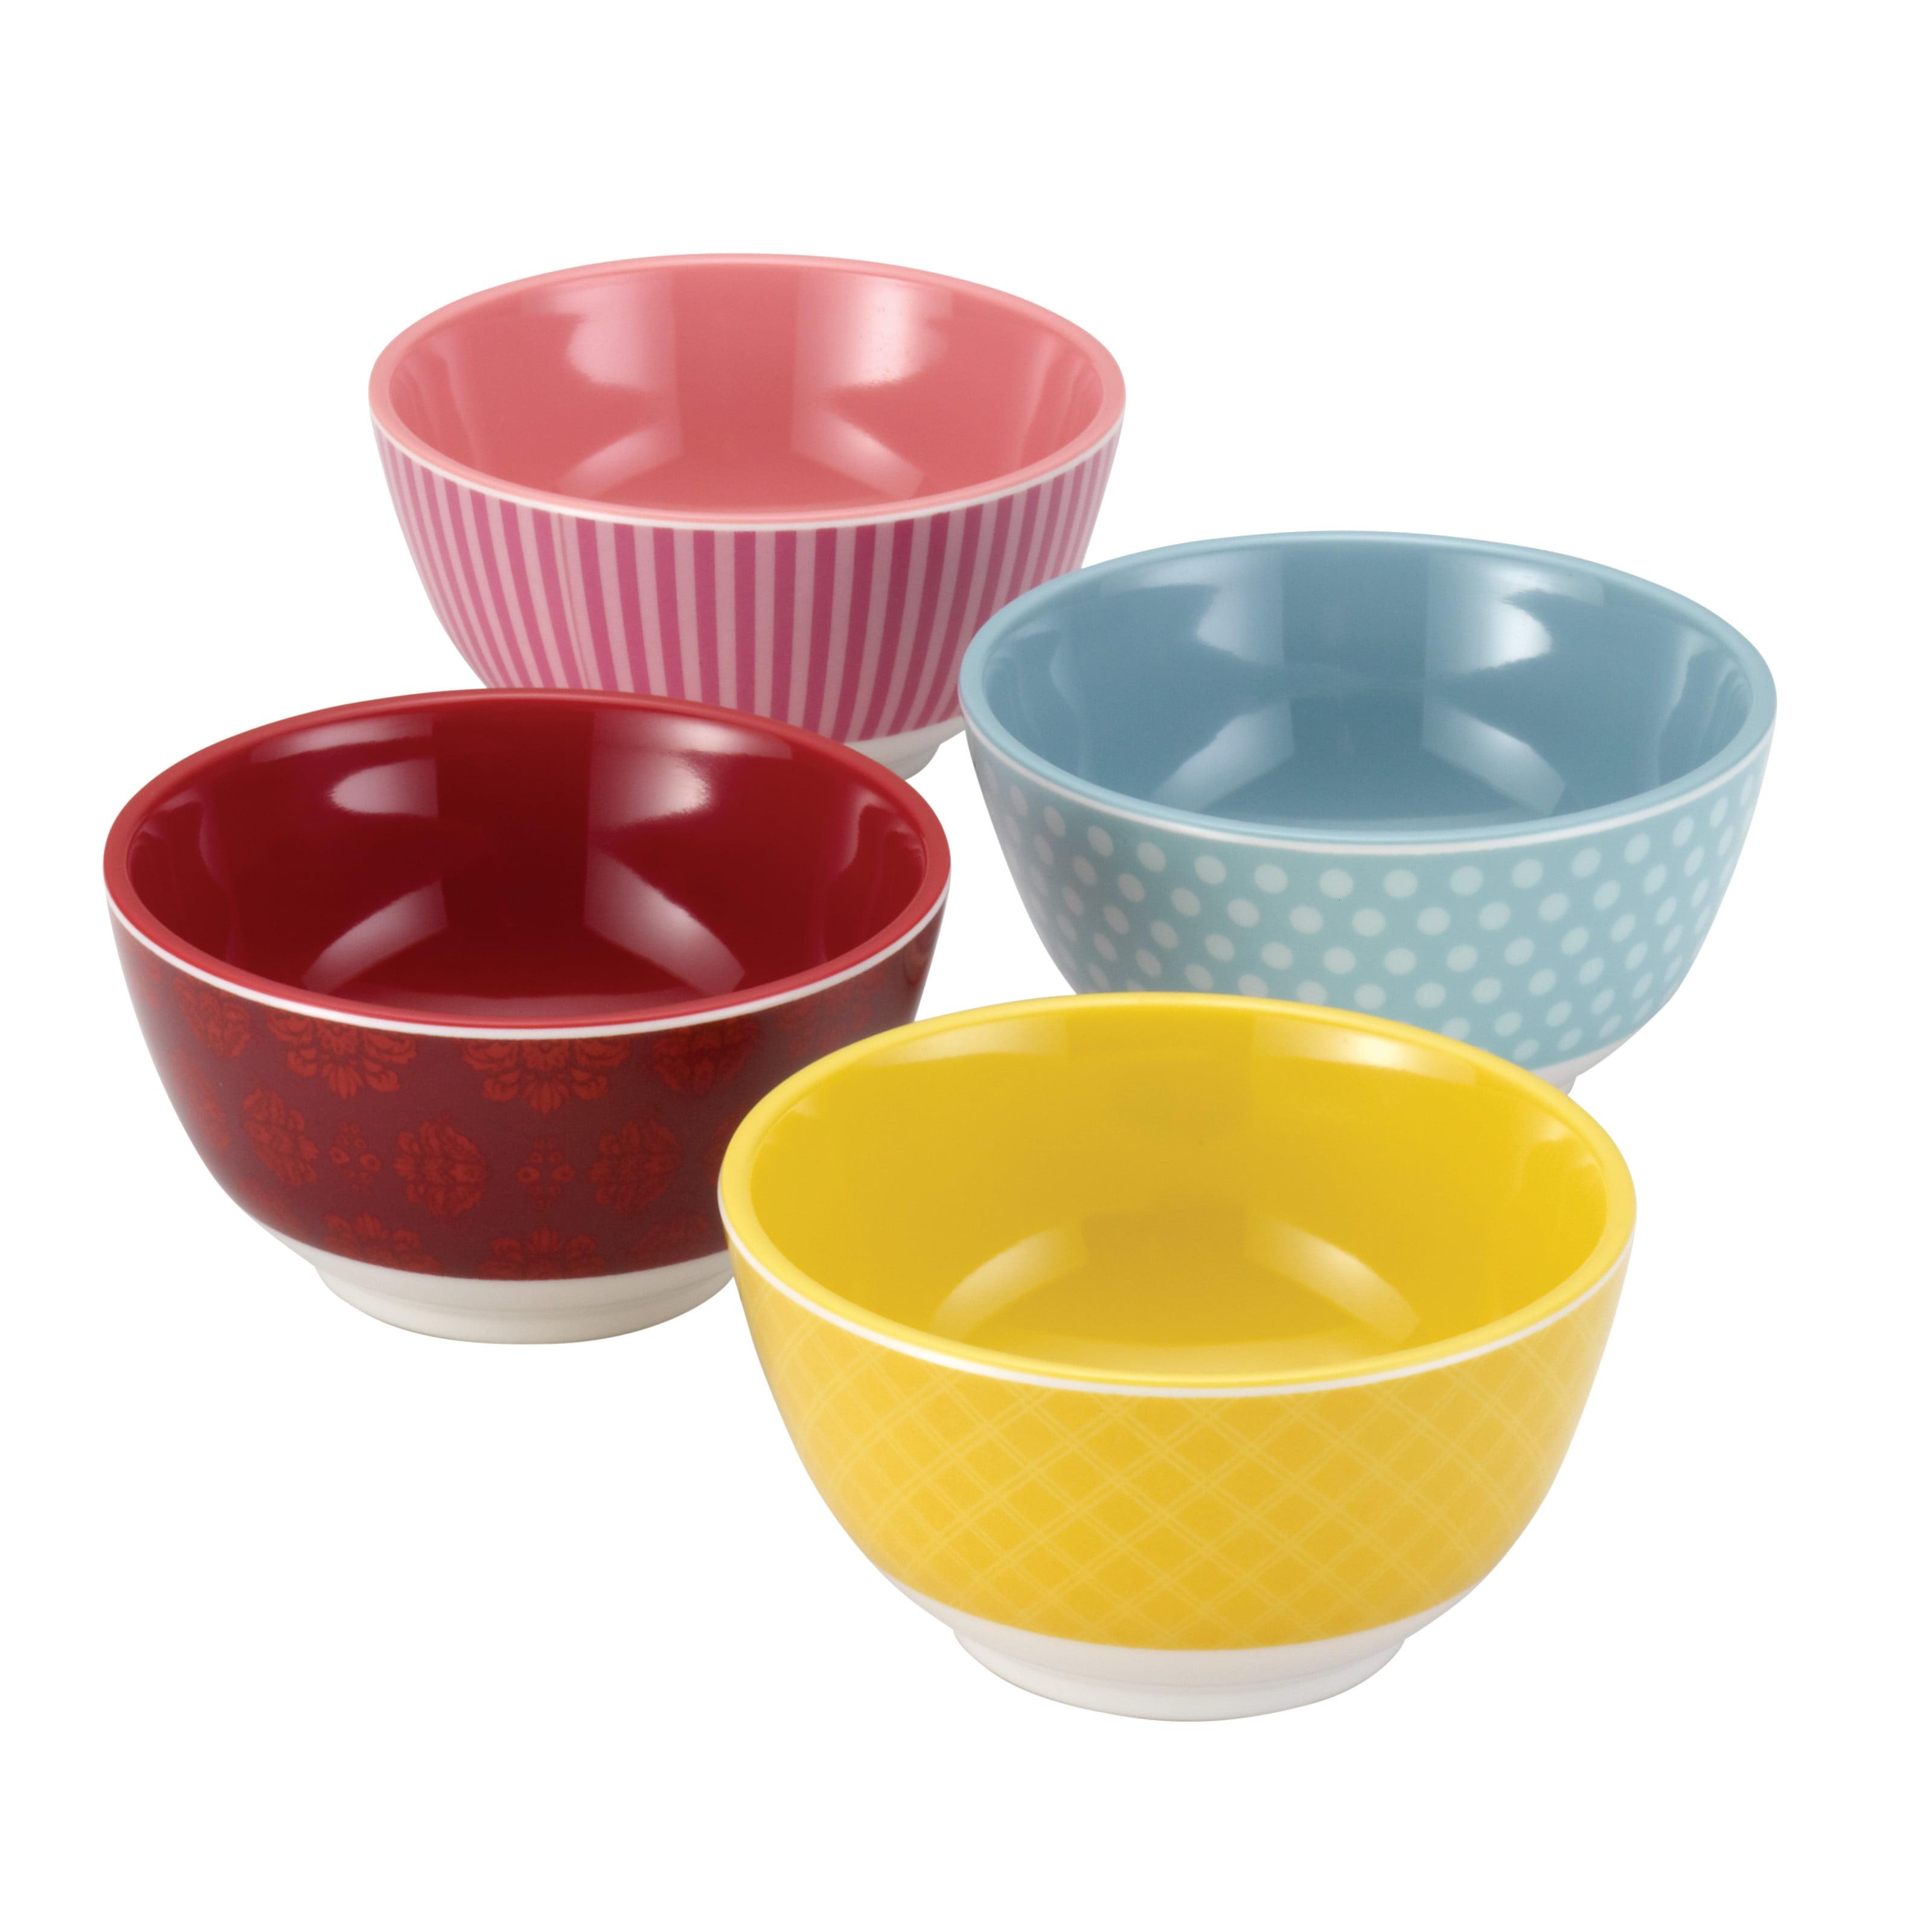 "Cake Boss Countertop Accessories 4-Piece Melamine Prep Bowl Set, ""Basic"" Pattern, Print"